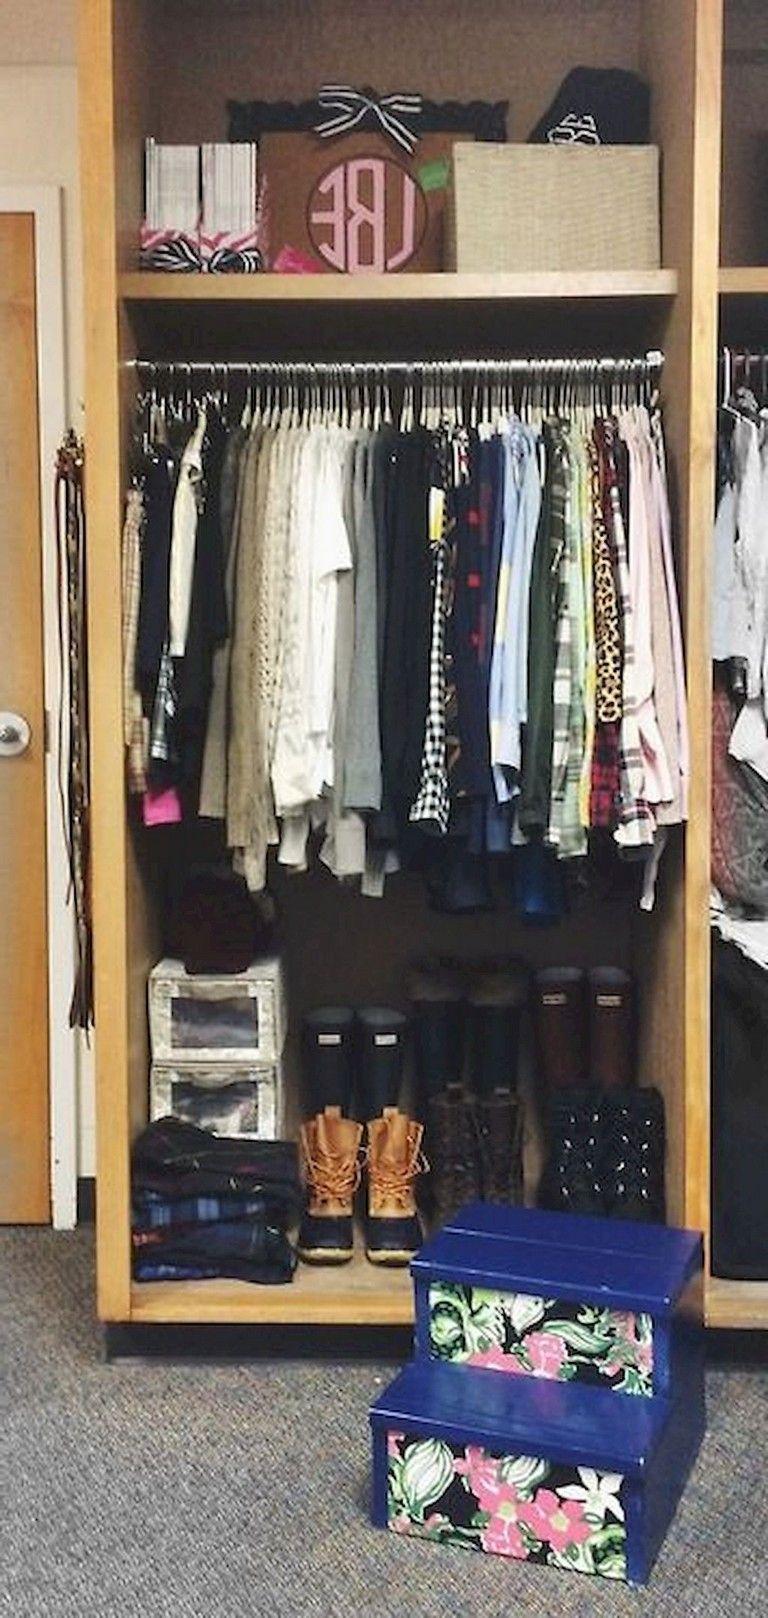 Organizing for Dormtips a small closet foto